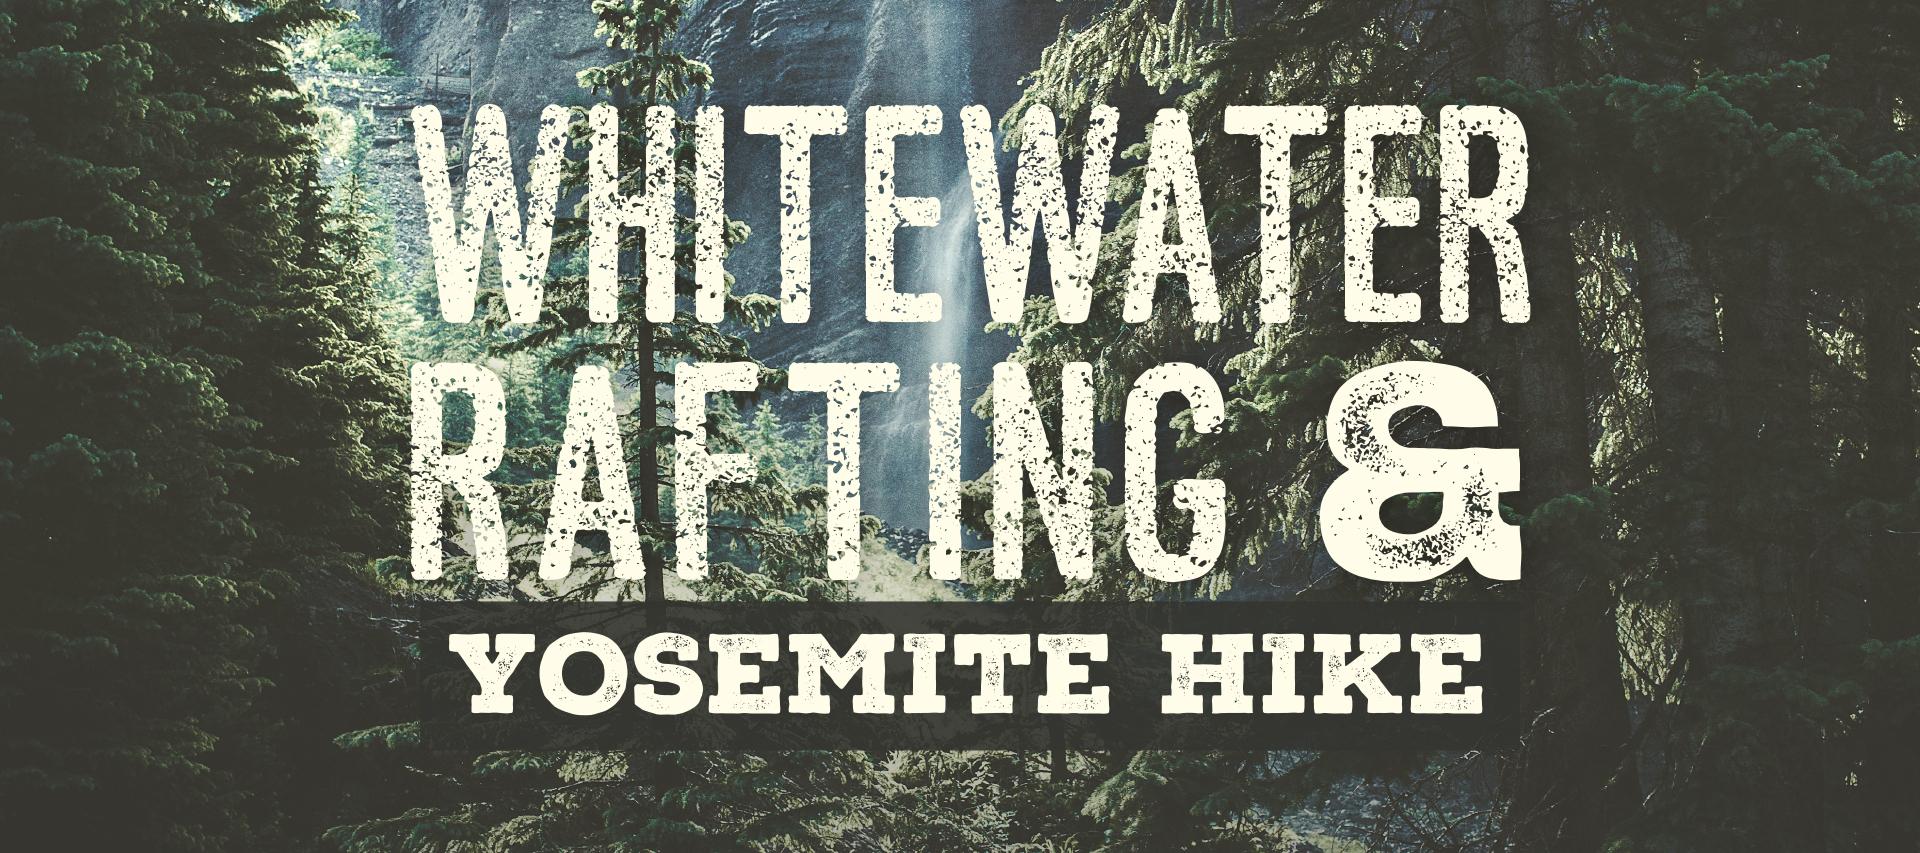 Men's Excel White Water Rafting 2018